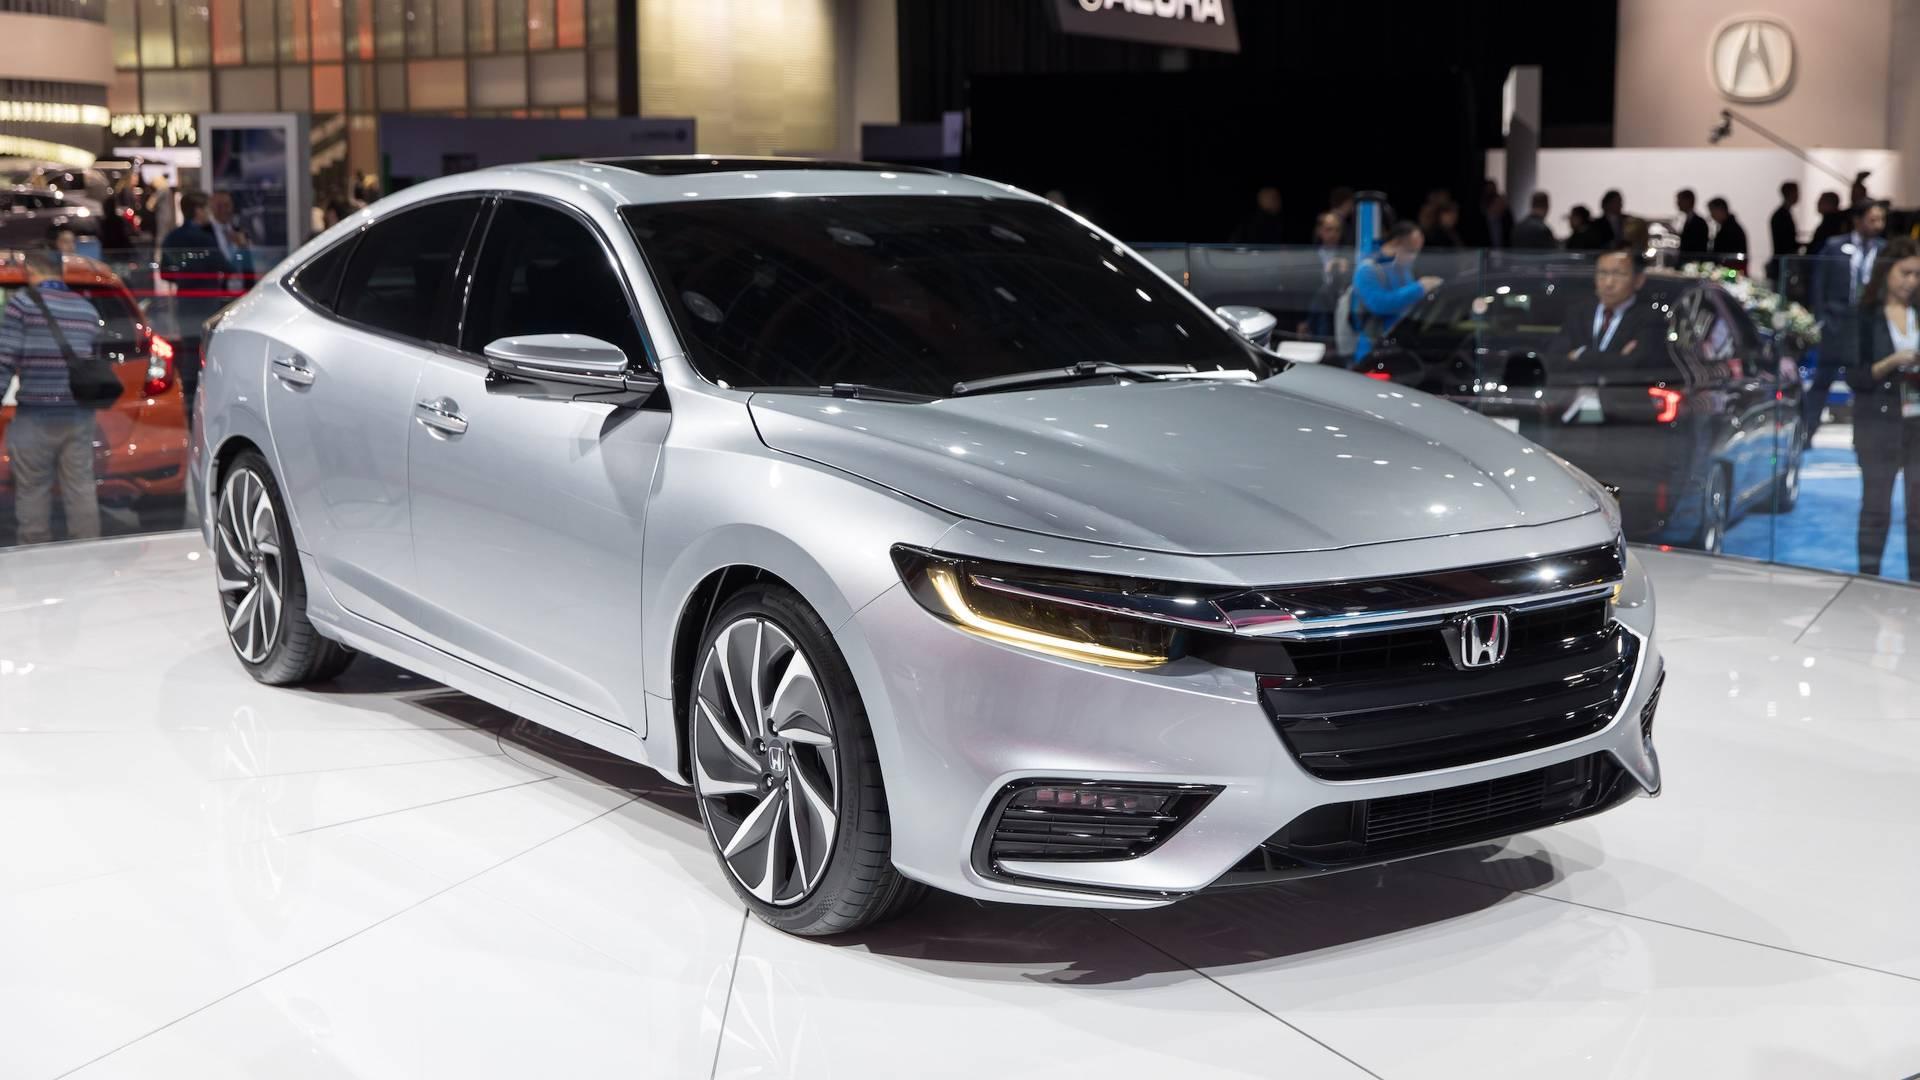 Honda Insight Prototype Closely Previews New Hybrid Sedan - Honda car show